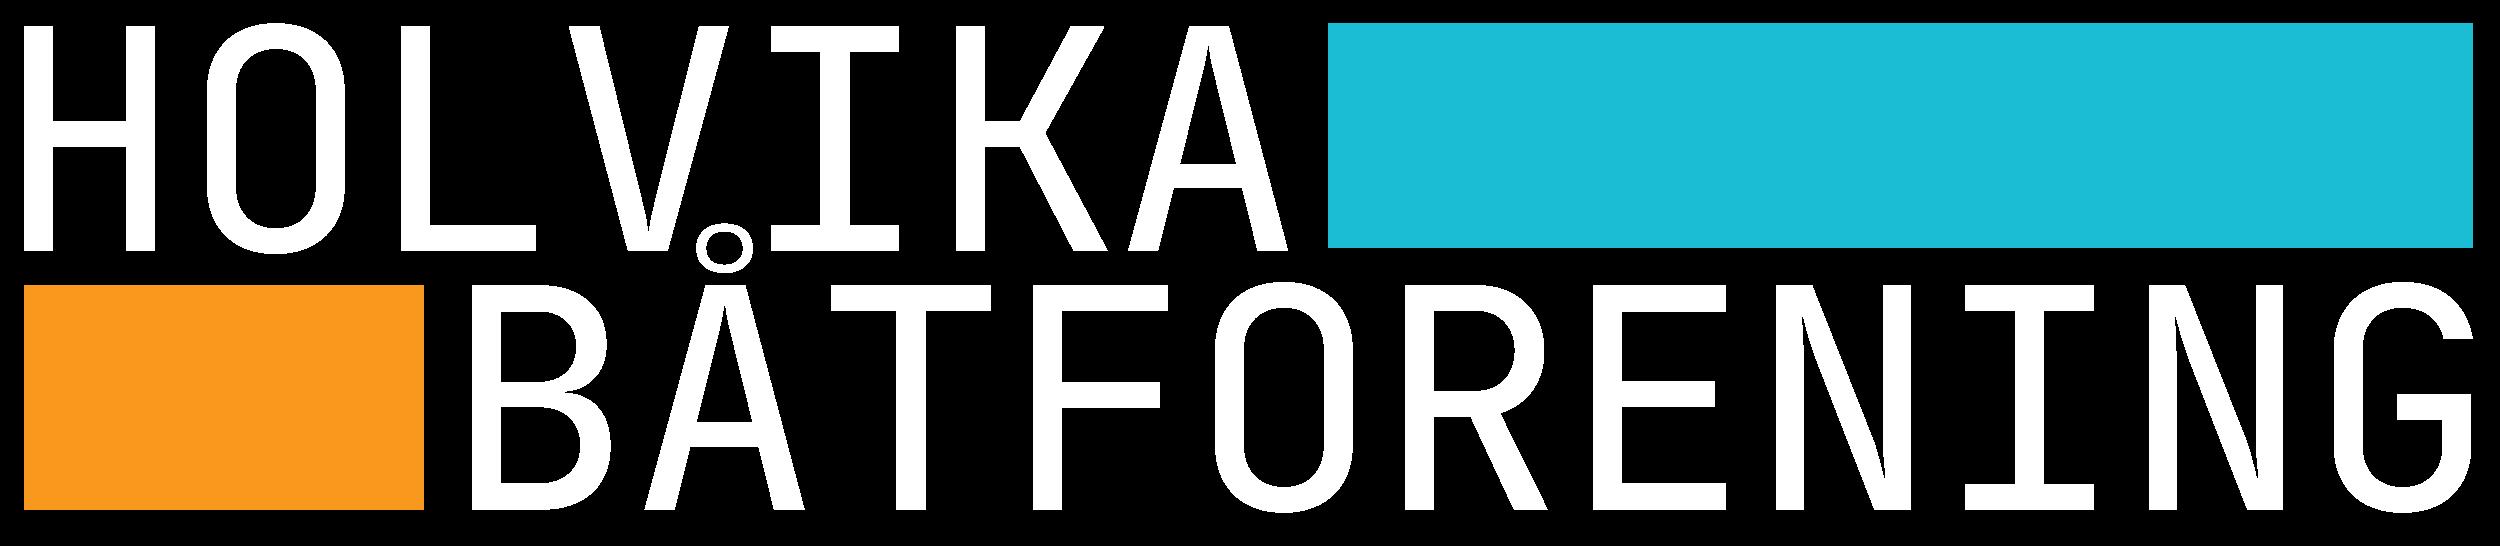 Holvika Båtforening